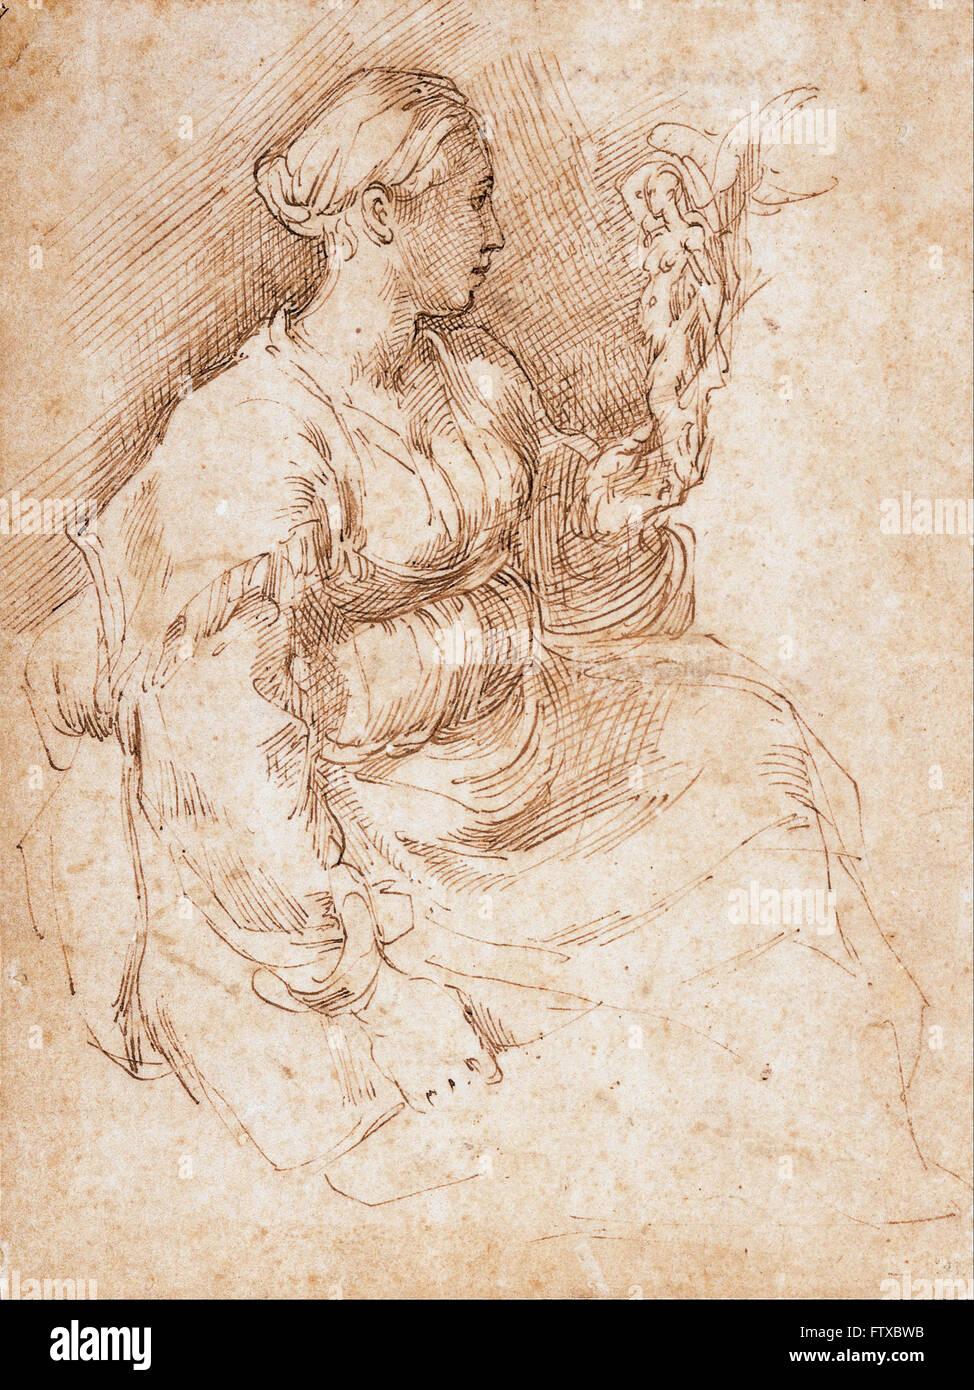 Parmigianino - Woman Seated Holding a Statuette of Victory -  Cincinnati Art Museum - Stock Image